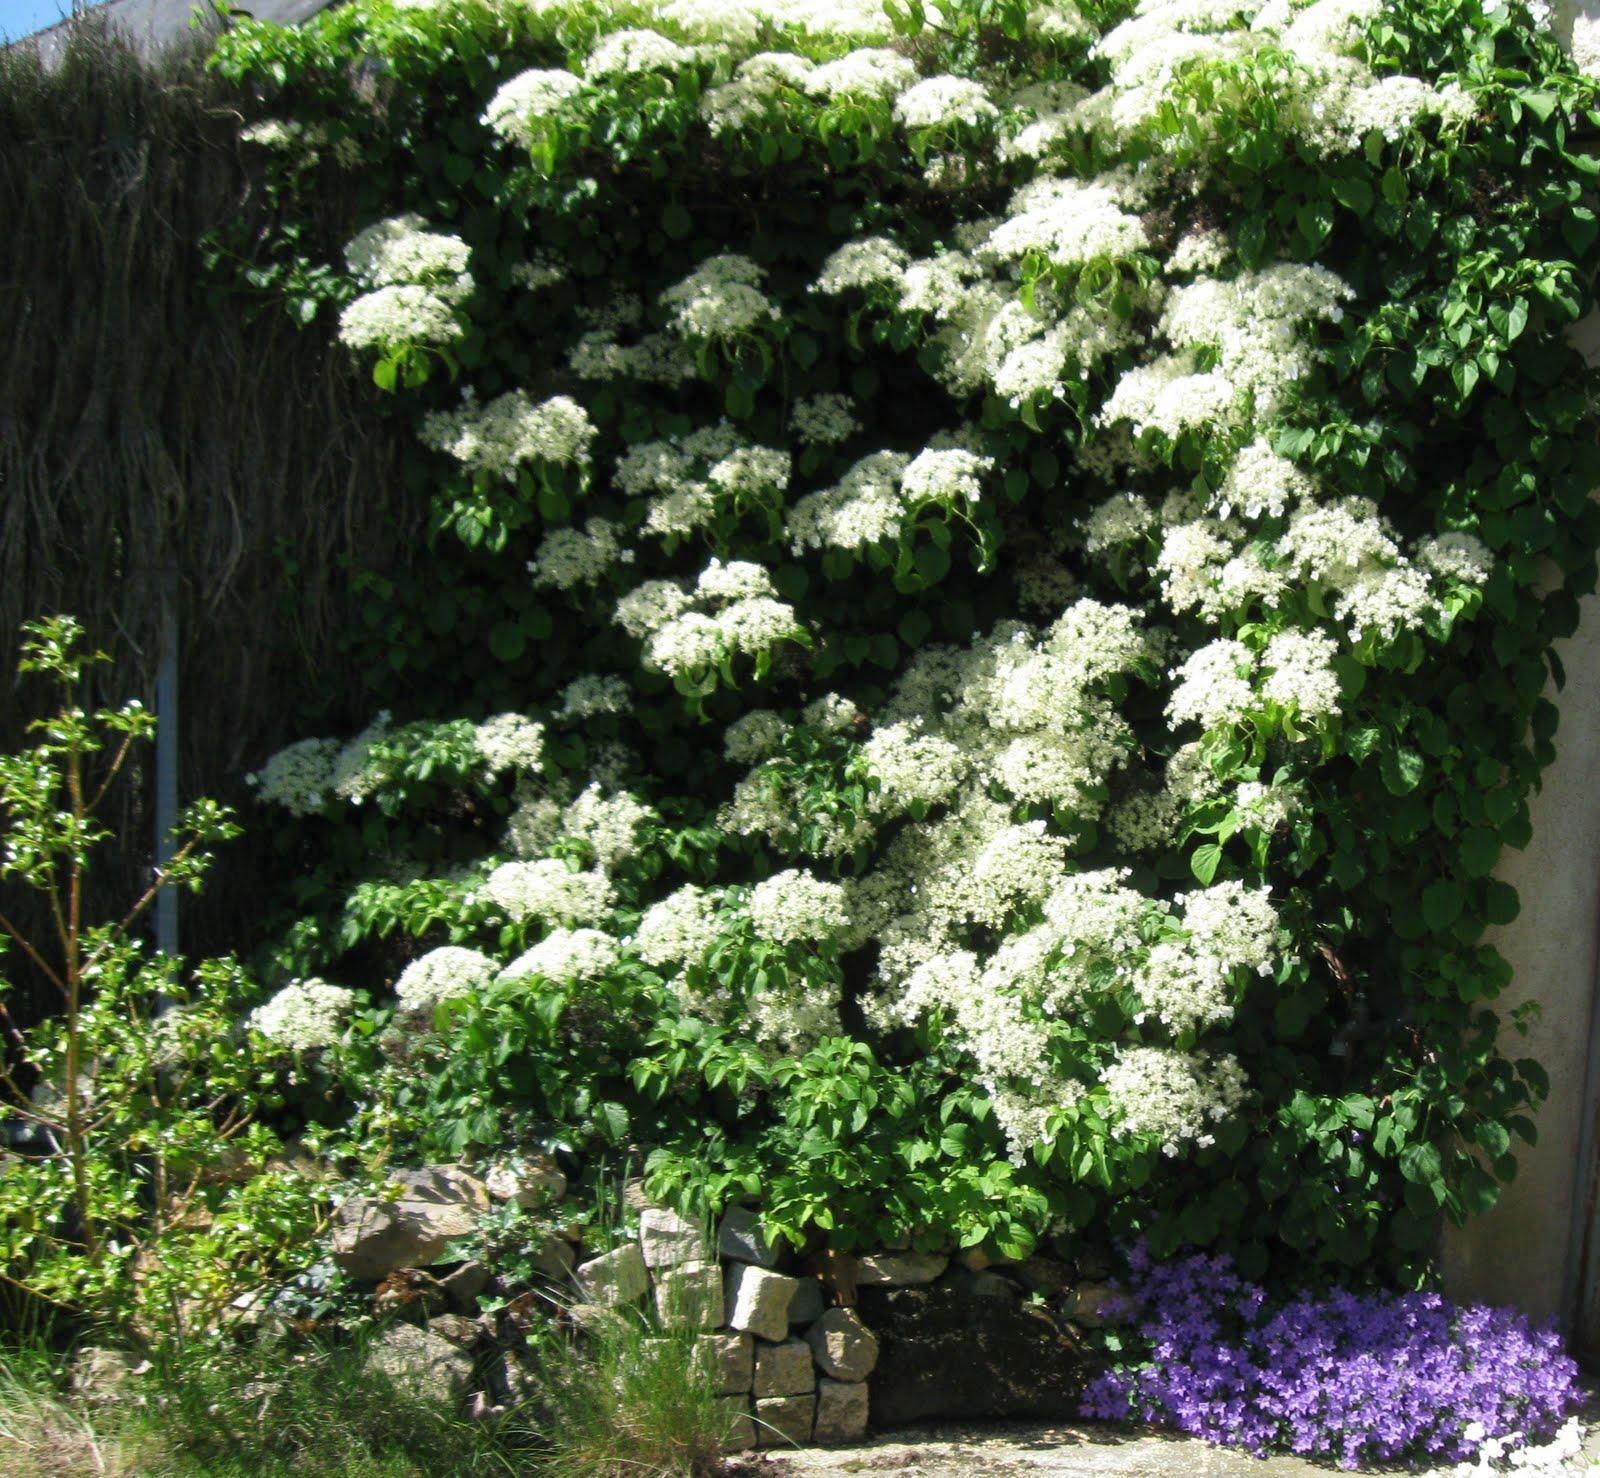 Le jardin de viviane l 39 hortensia grimpant hydrangea p tiolaris - Piante bellissime da giardino ...